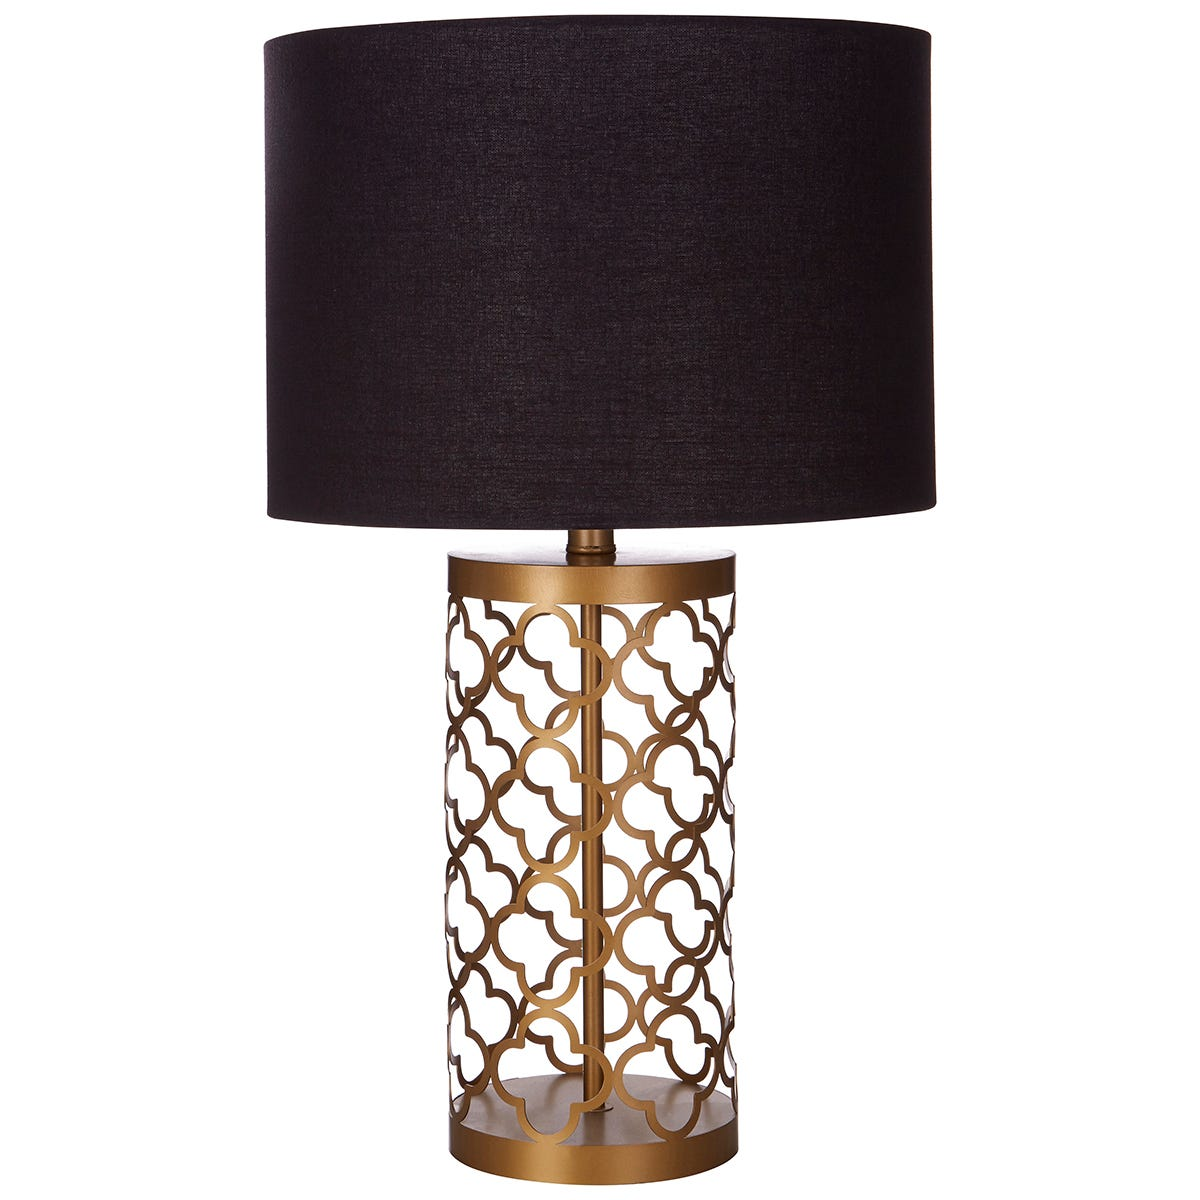 Premier Housewares Lexis Table Lamp with Copper Lattice Body & Black Shade